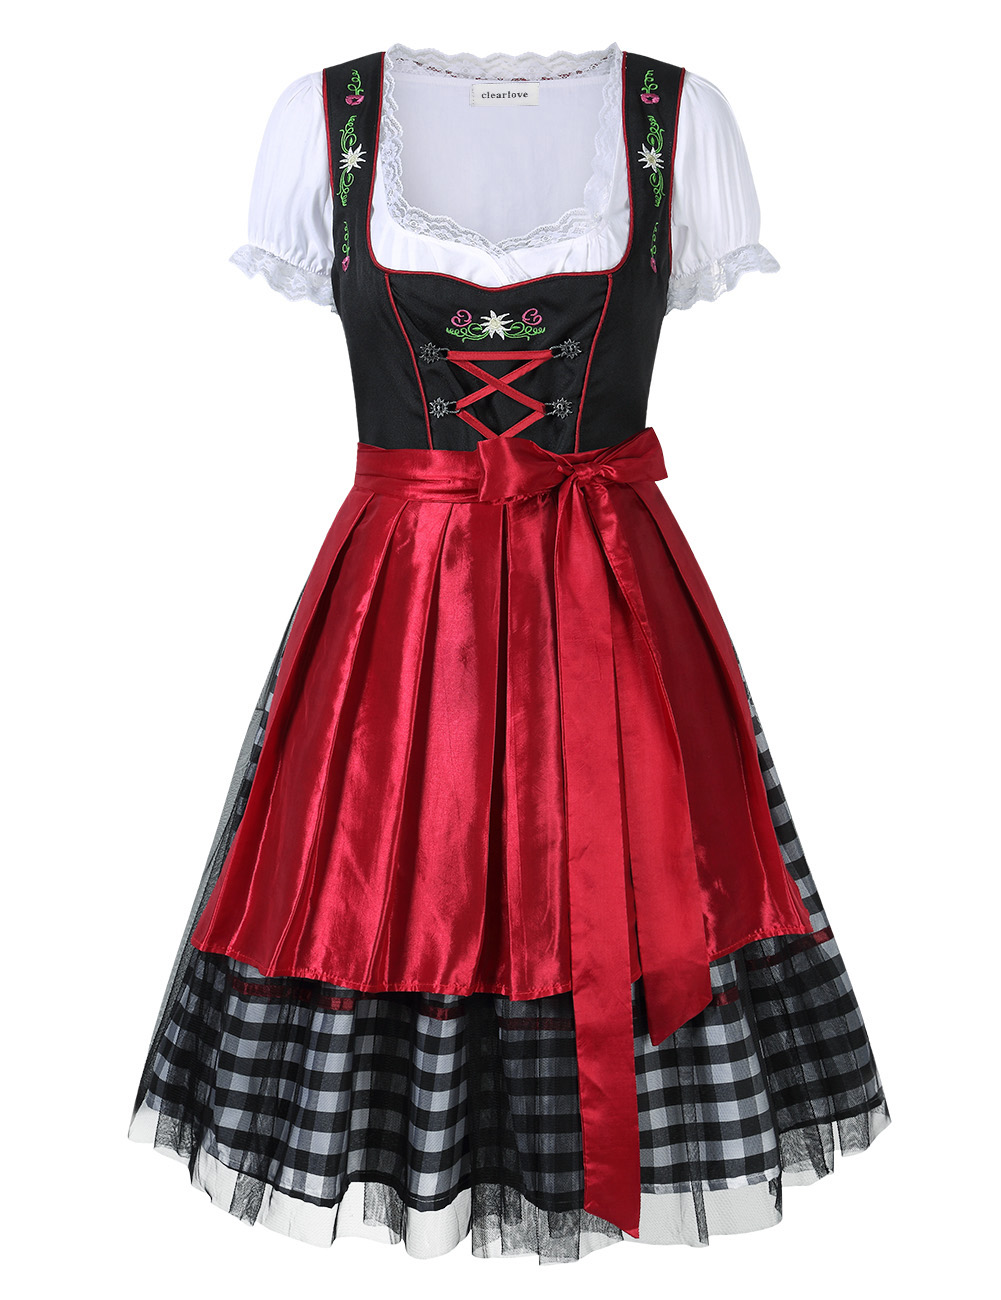 Clearlove Women's Oktoberfest Dresses Plaid Mesh Stitching Embroidery Formal Dresses Suit